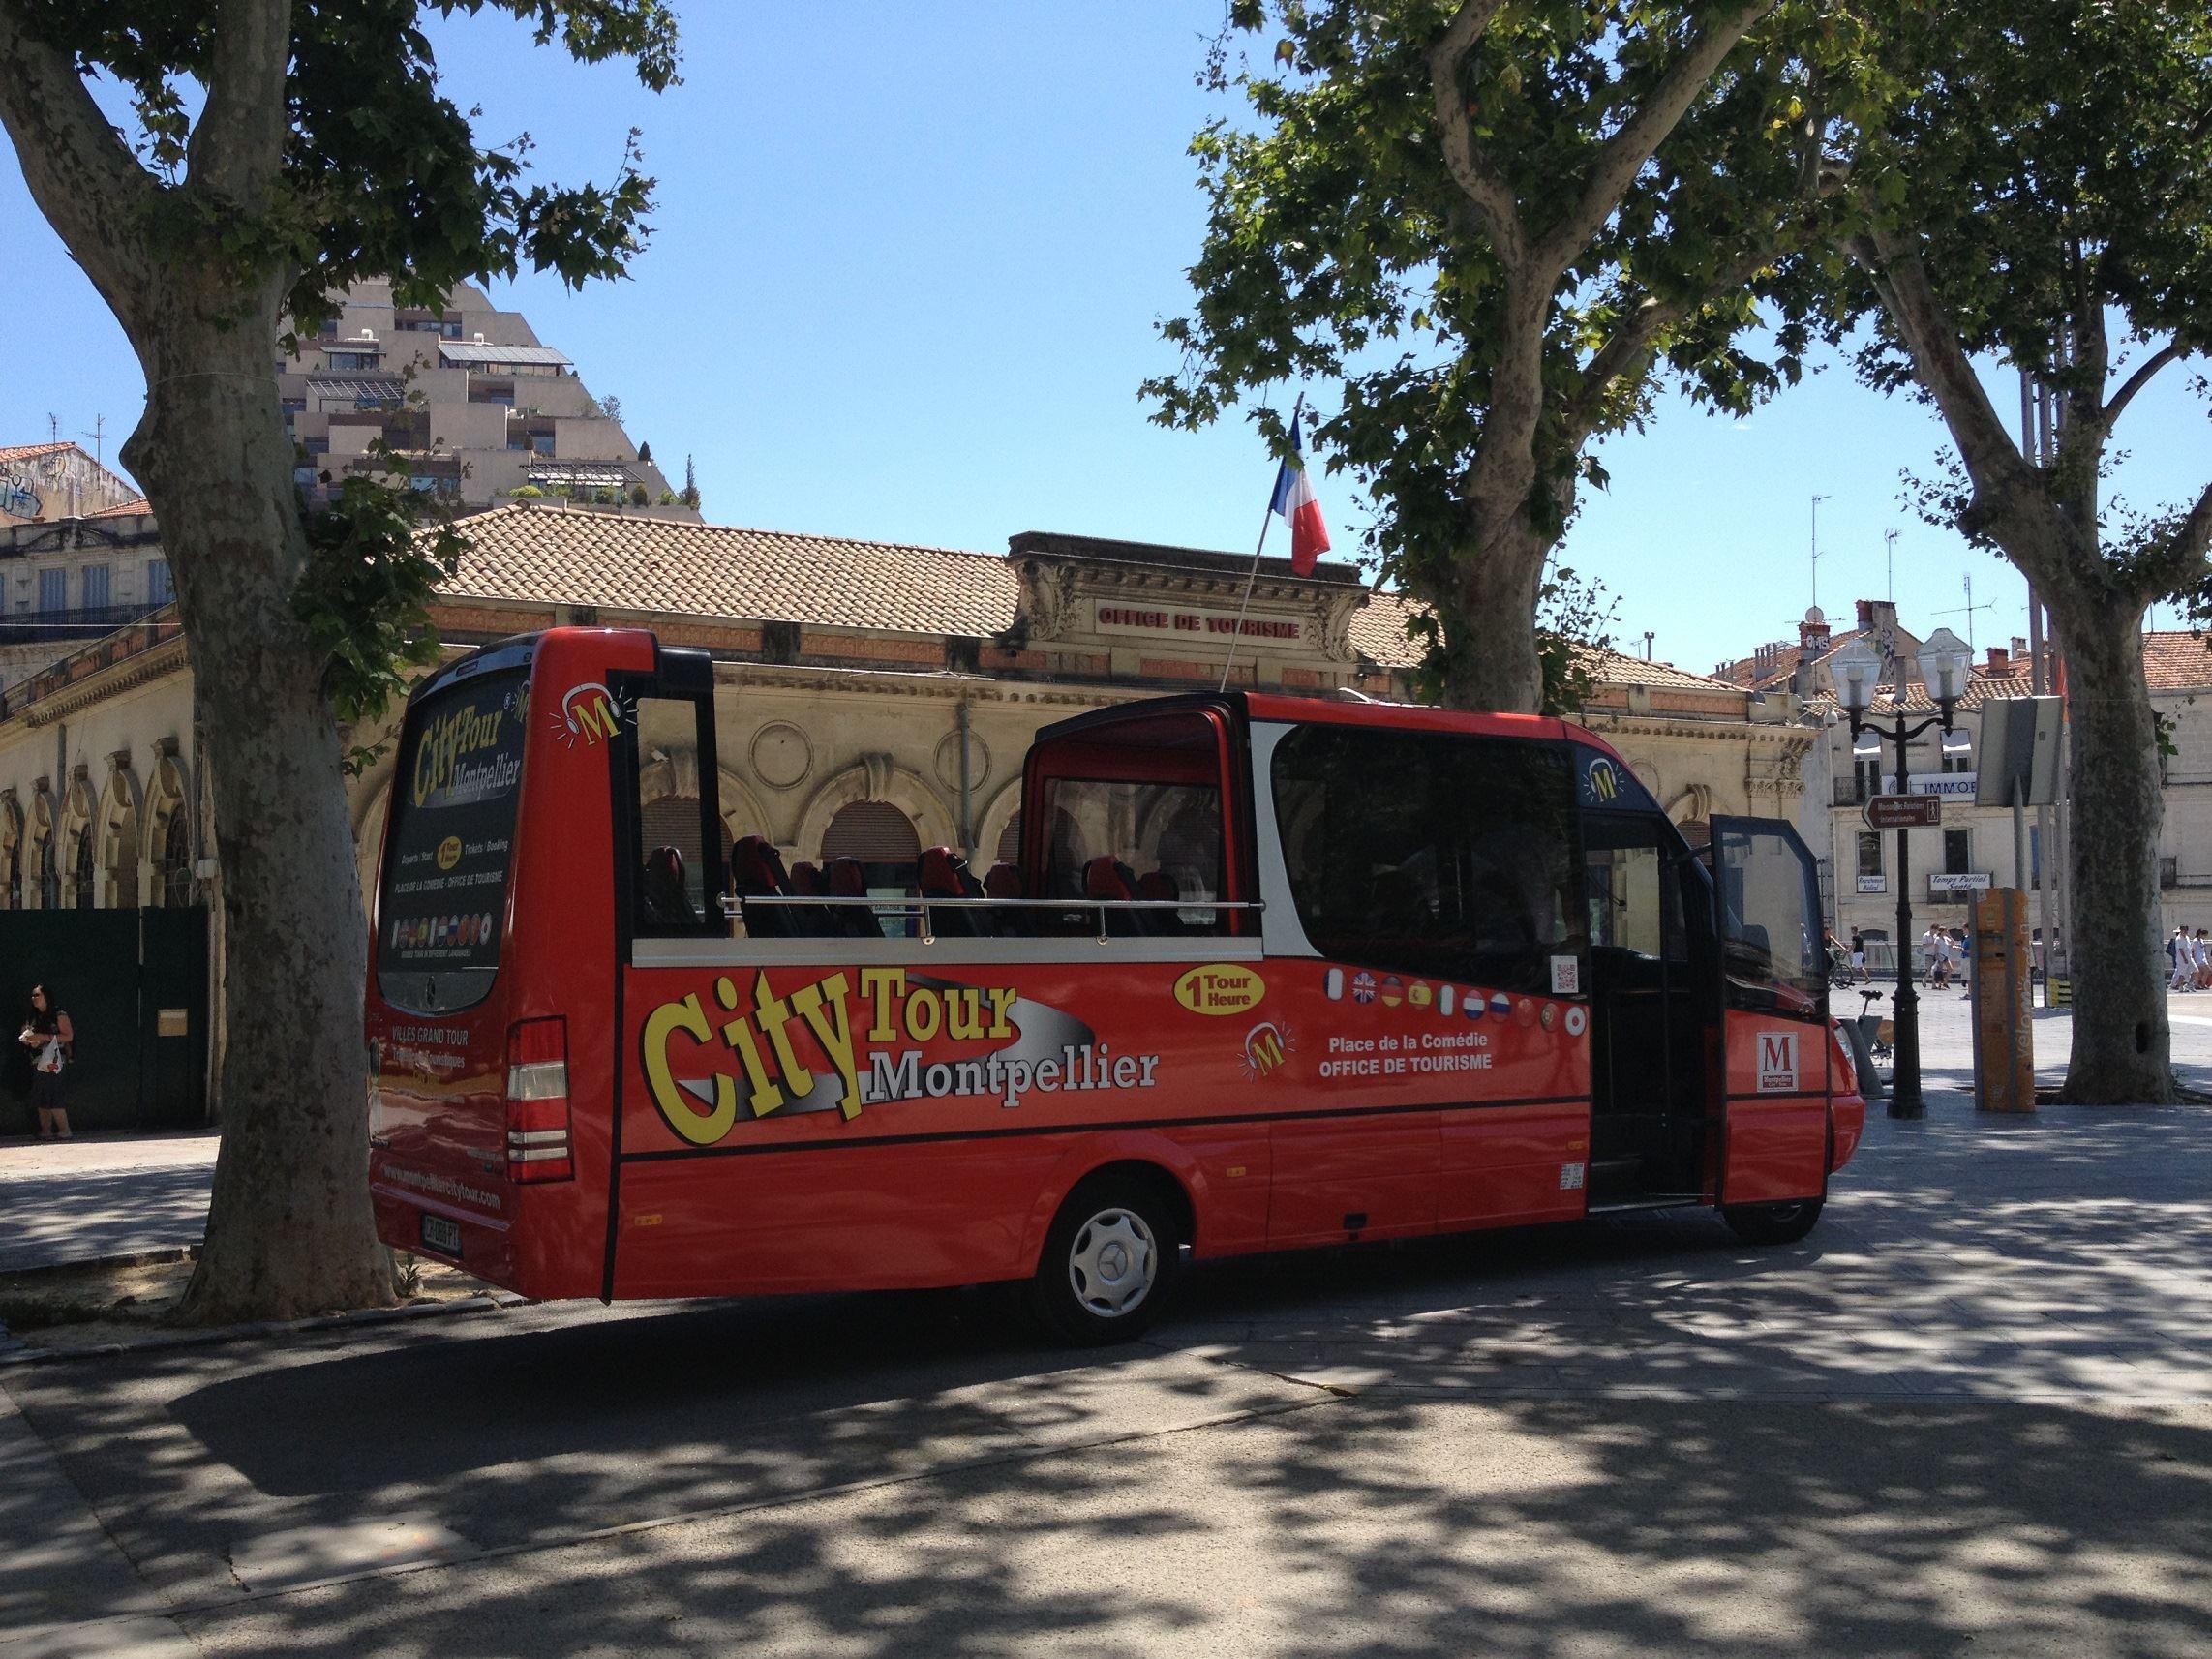 Montpellier City Tour